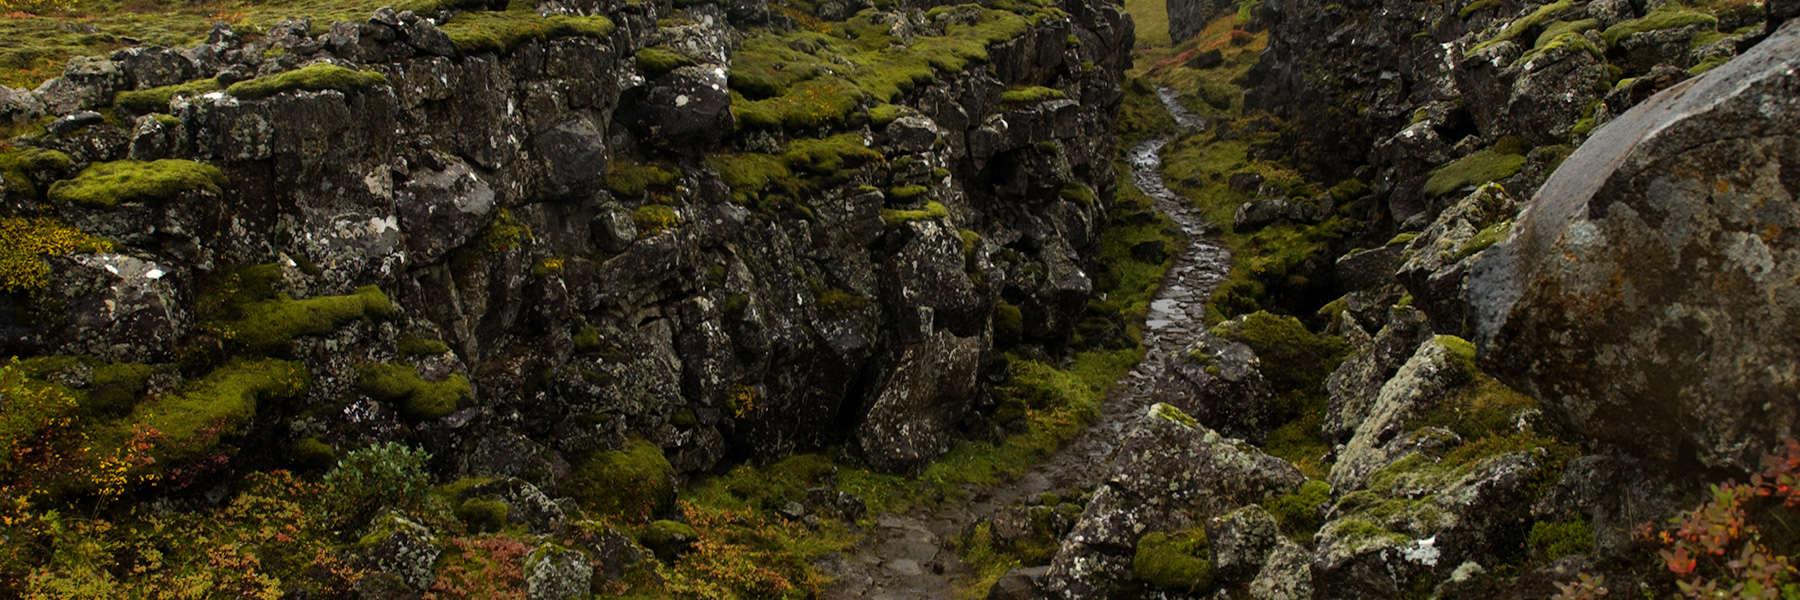 Thingvallavatn, Iceland